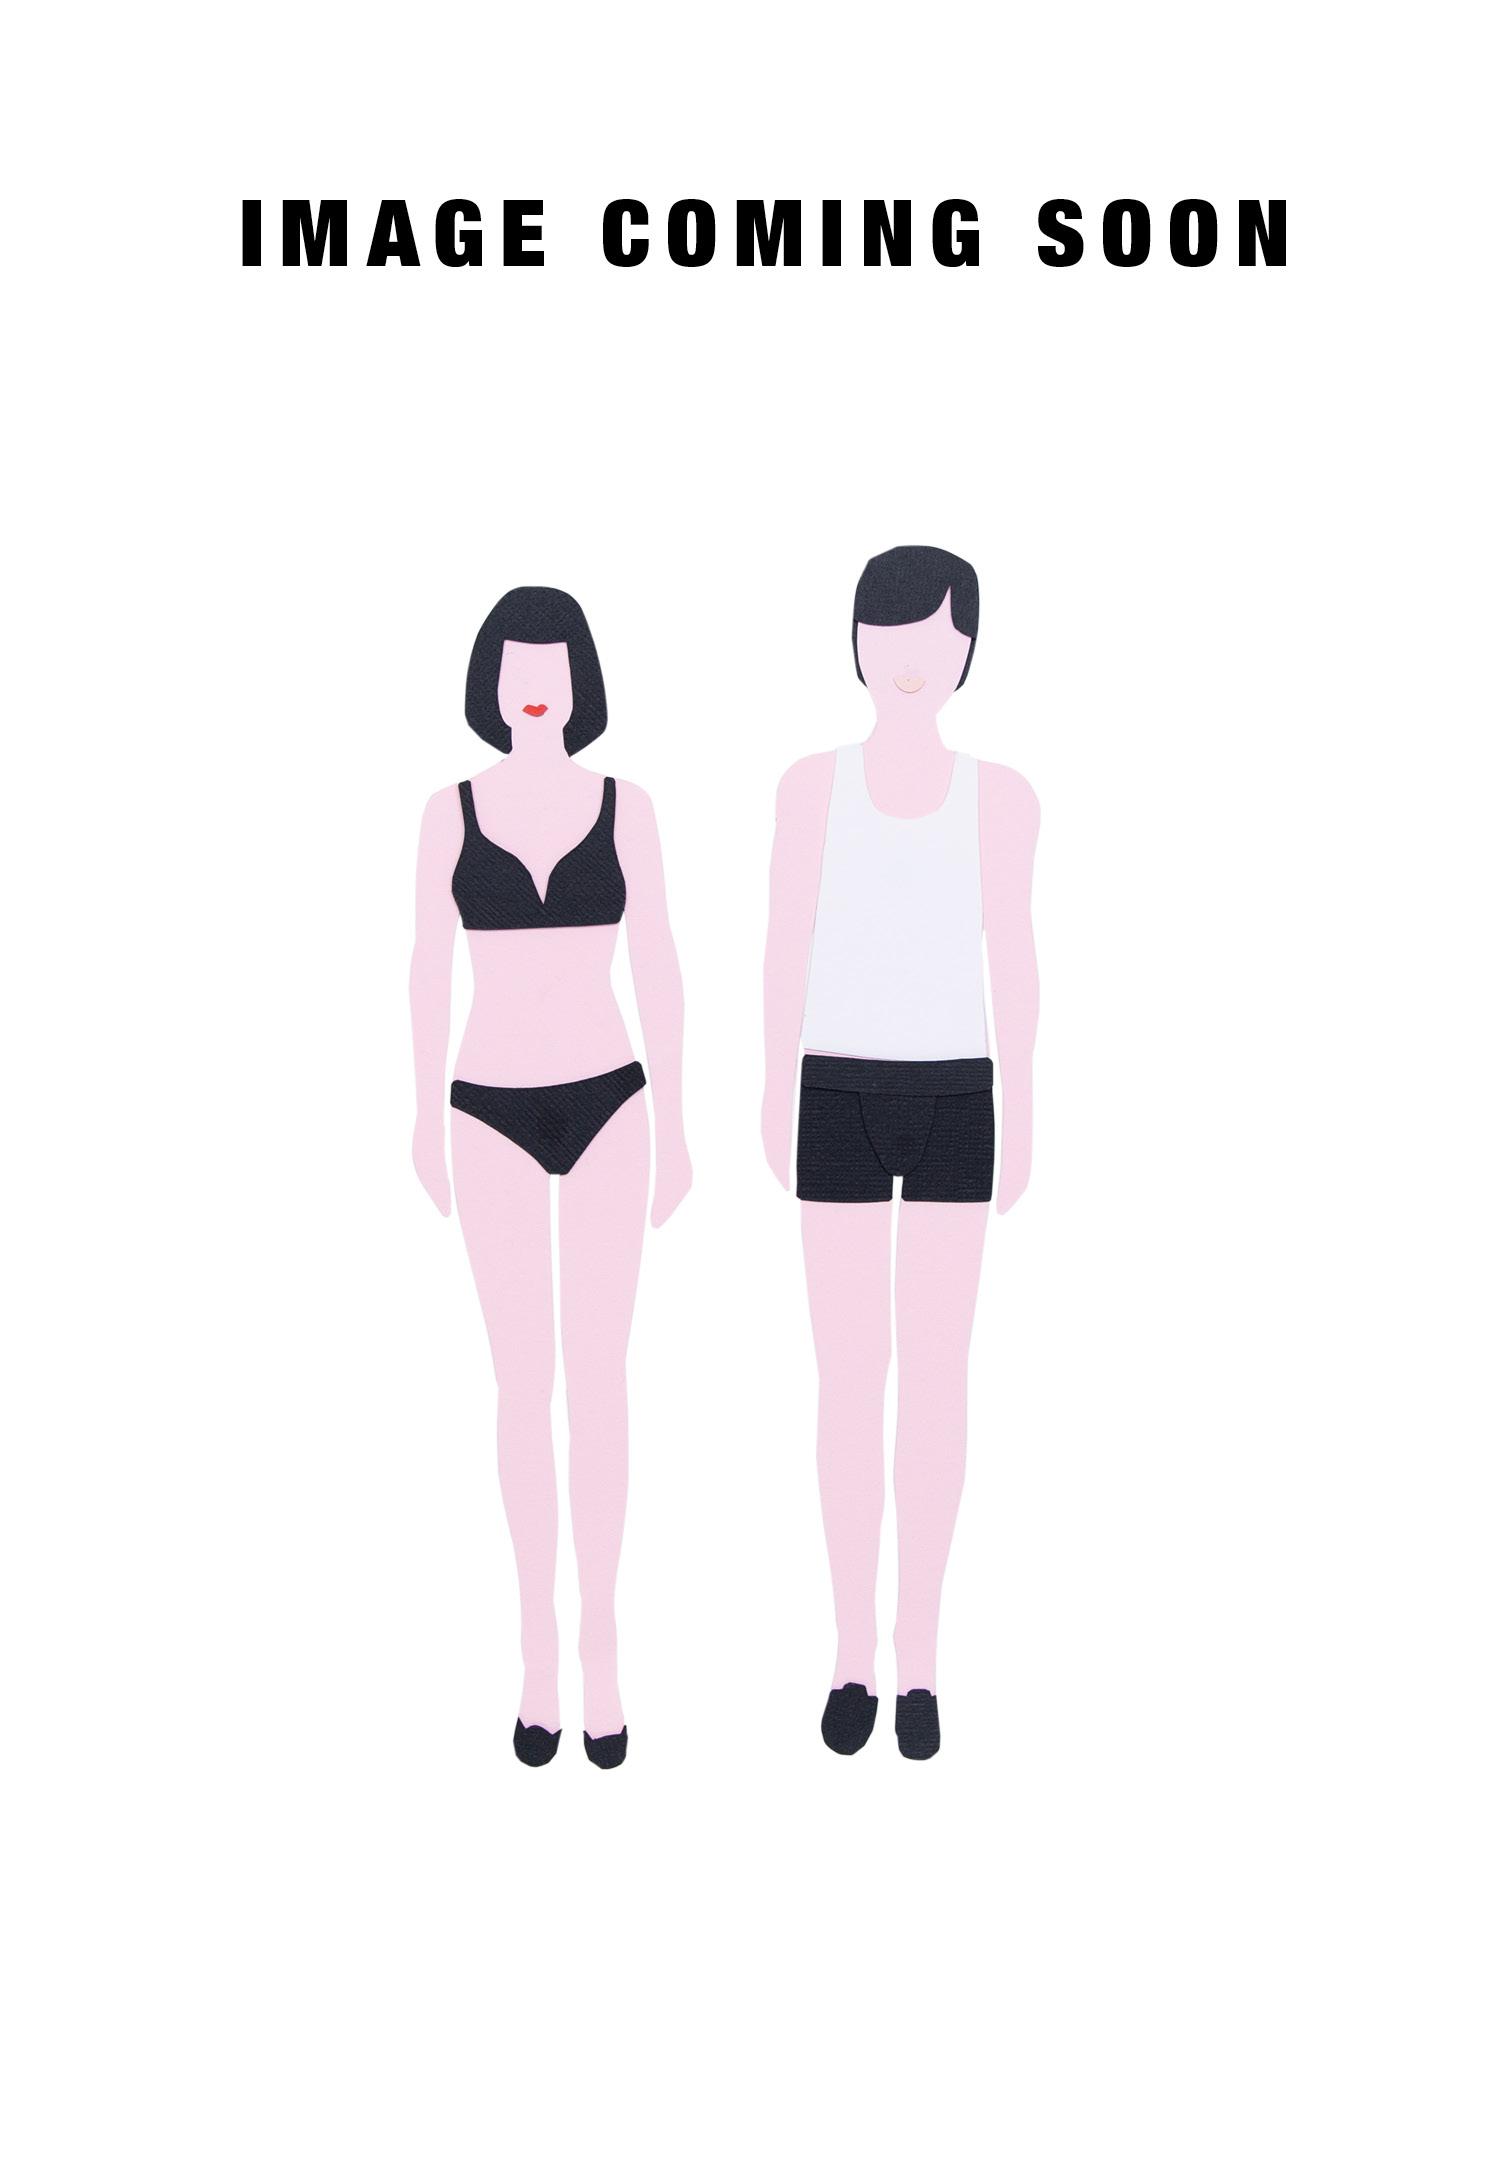 SKINY_Basic_M_ShirtCollection_shirtsslv2pack_086912_080500_010.jpg